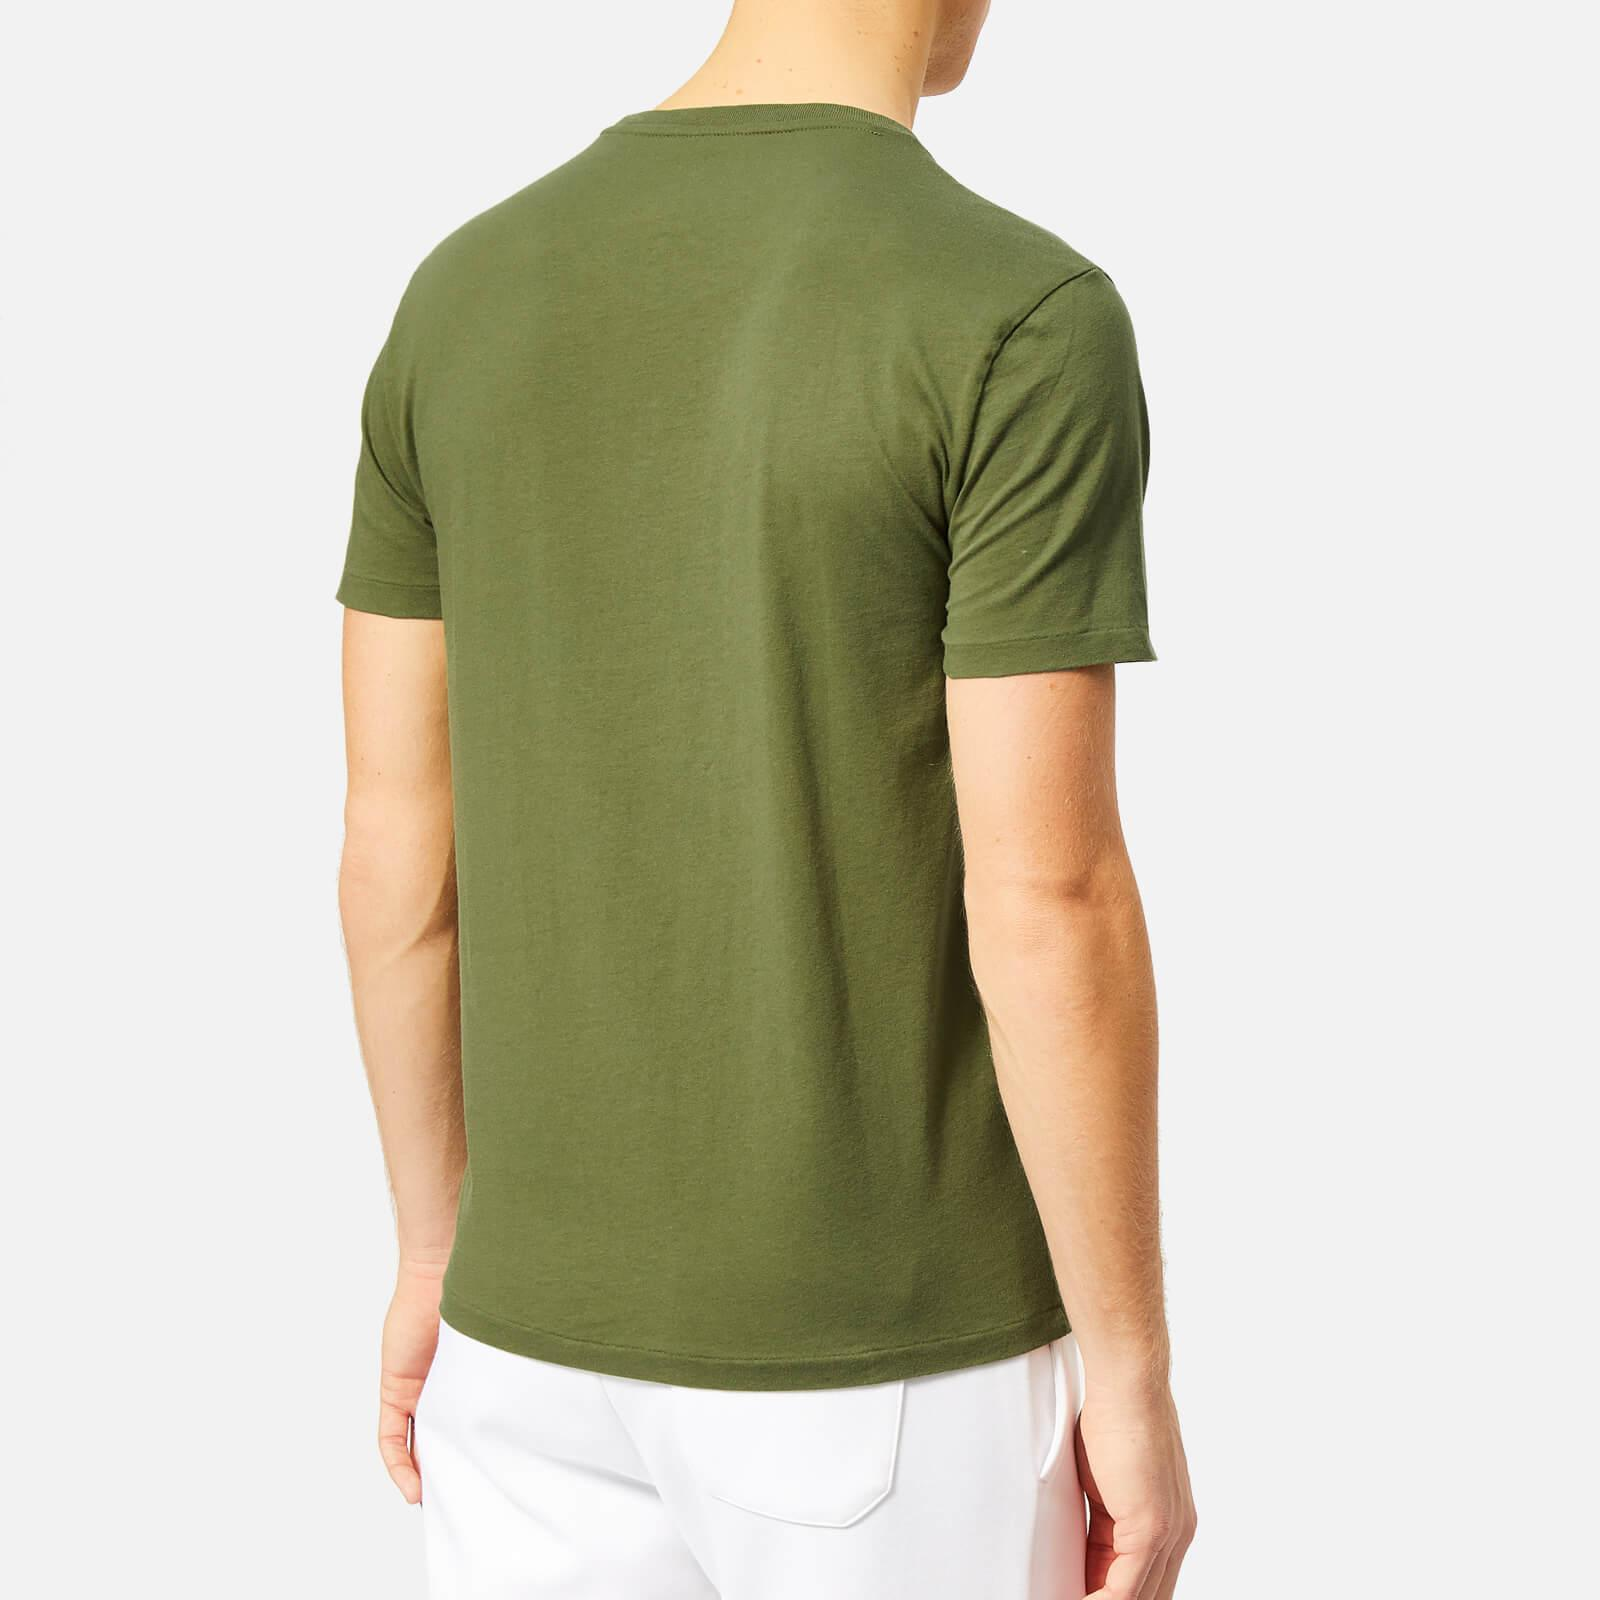 0c643037 Polo Ralph Lauren - Green Custom Slim Fit Crew Neck T-shirt for Men -. View  fullscreen